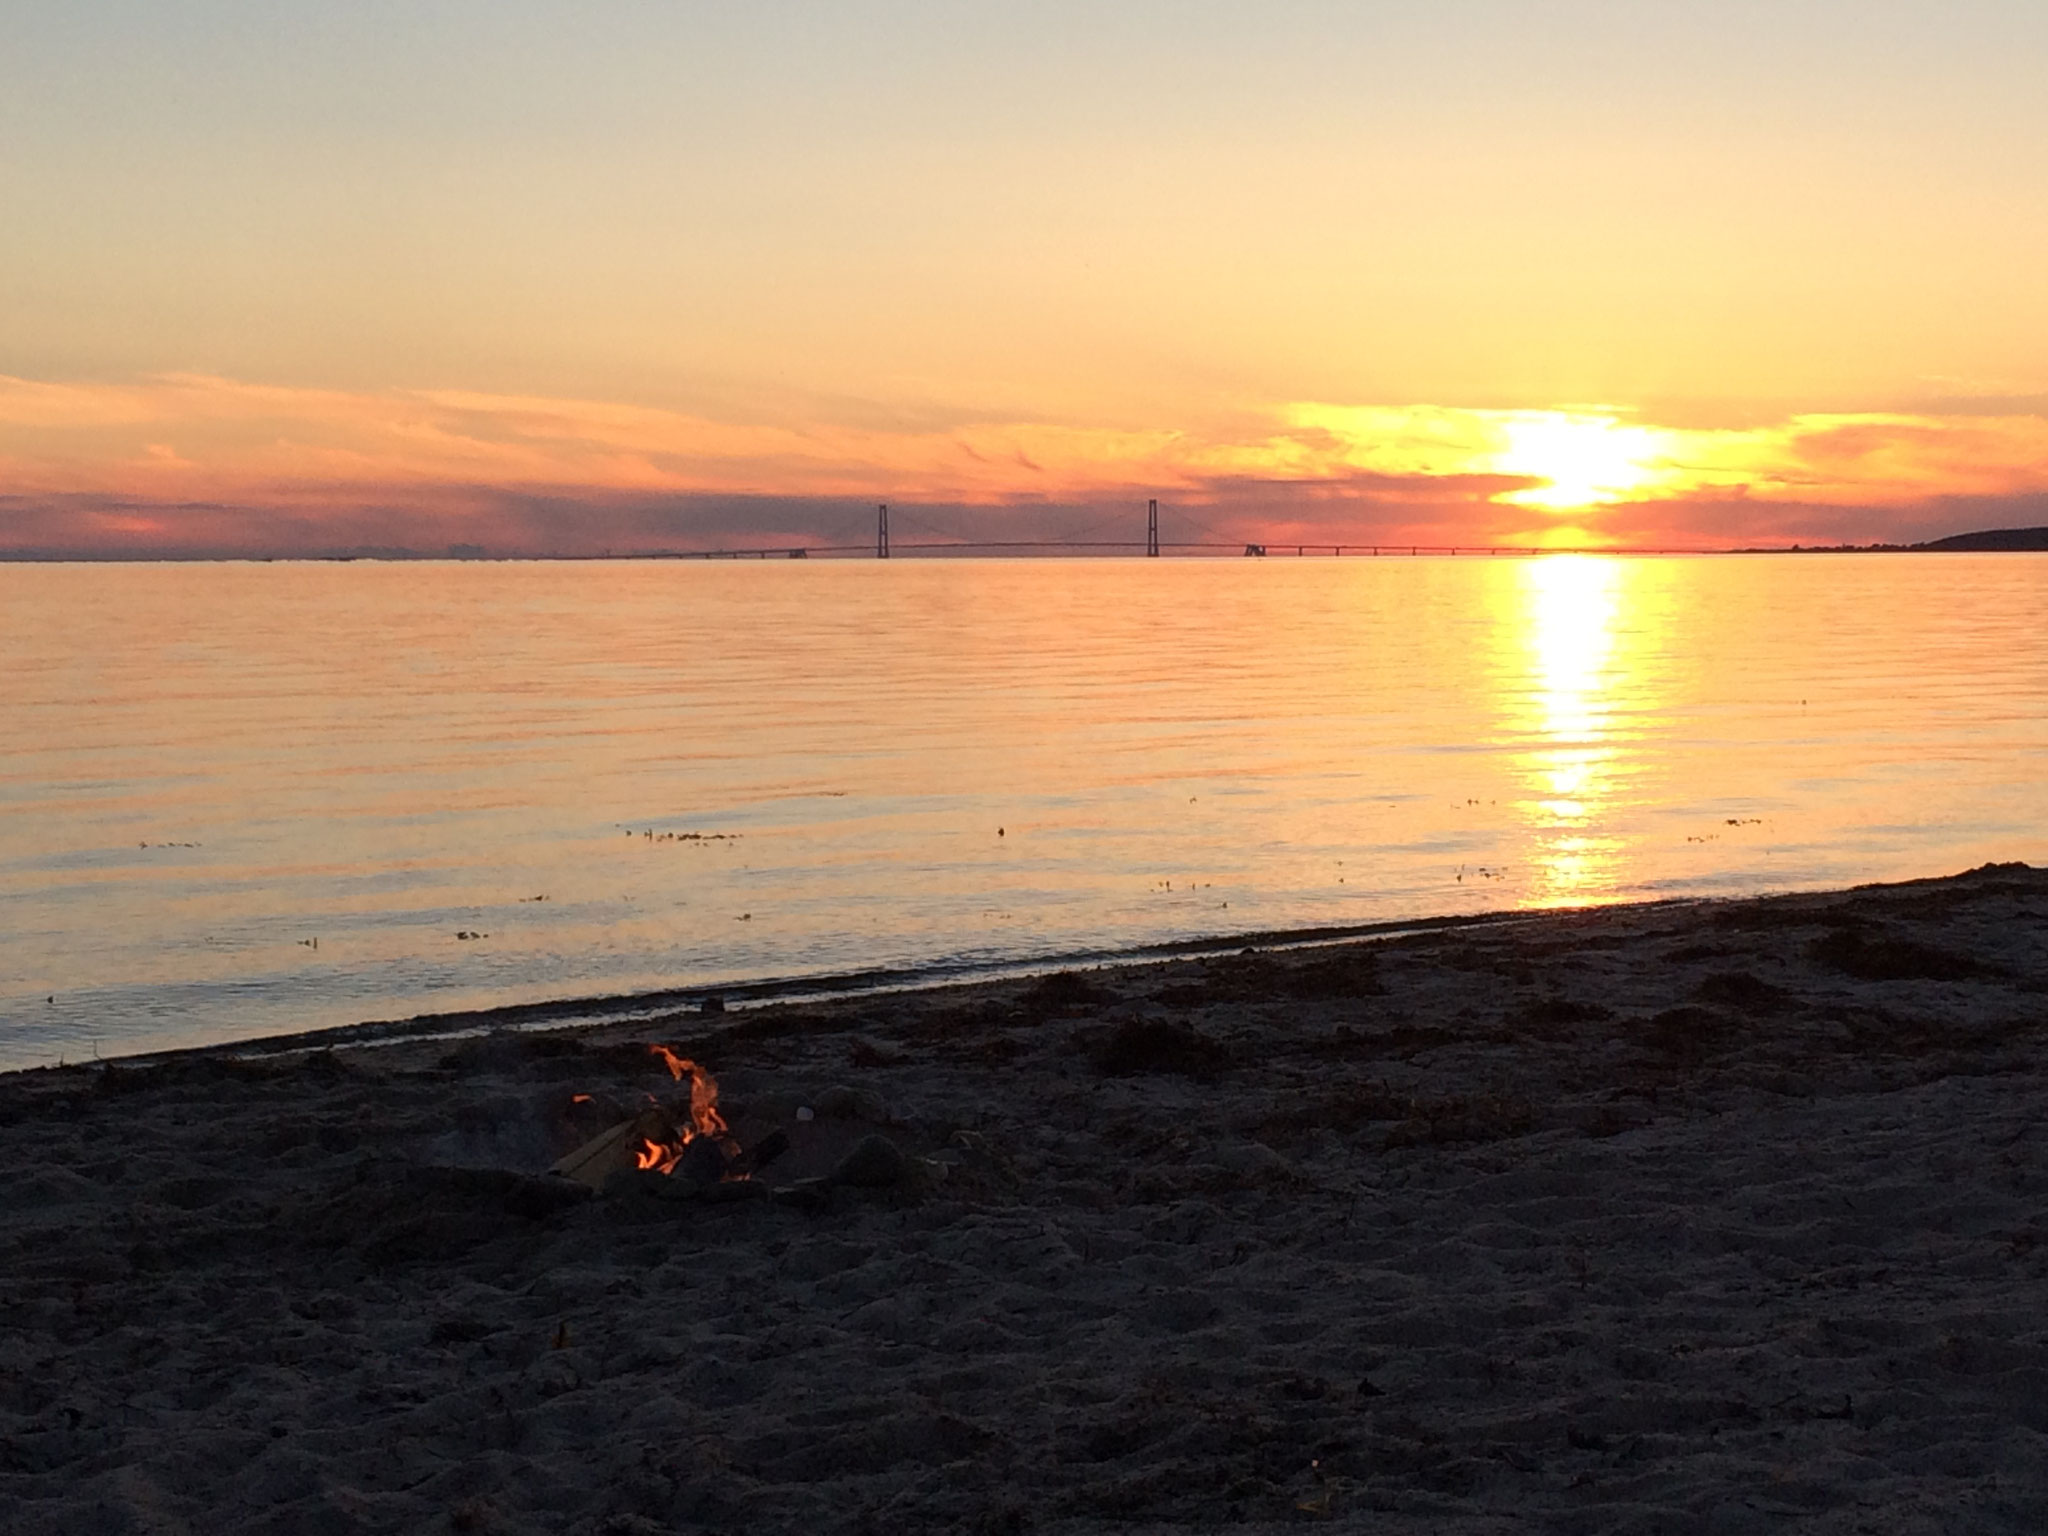 Sonnenuntergang am Strand in Skaelskor